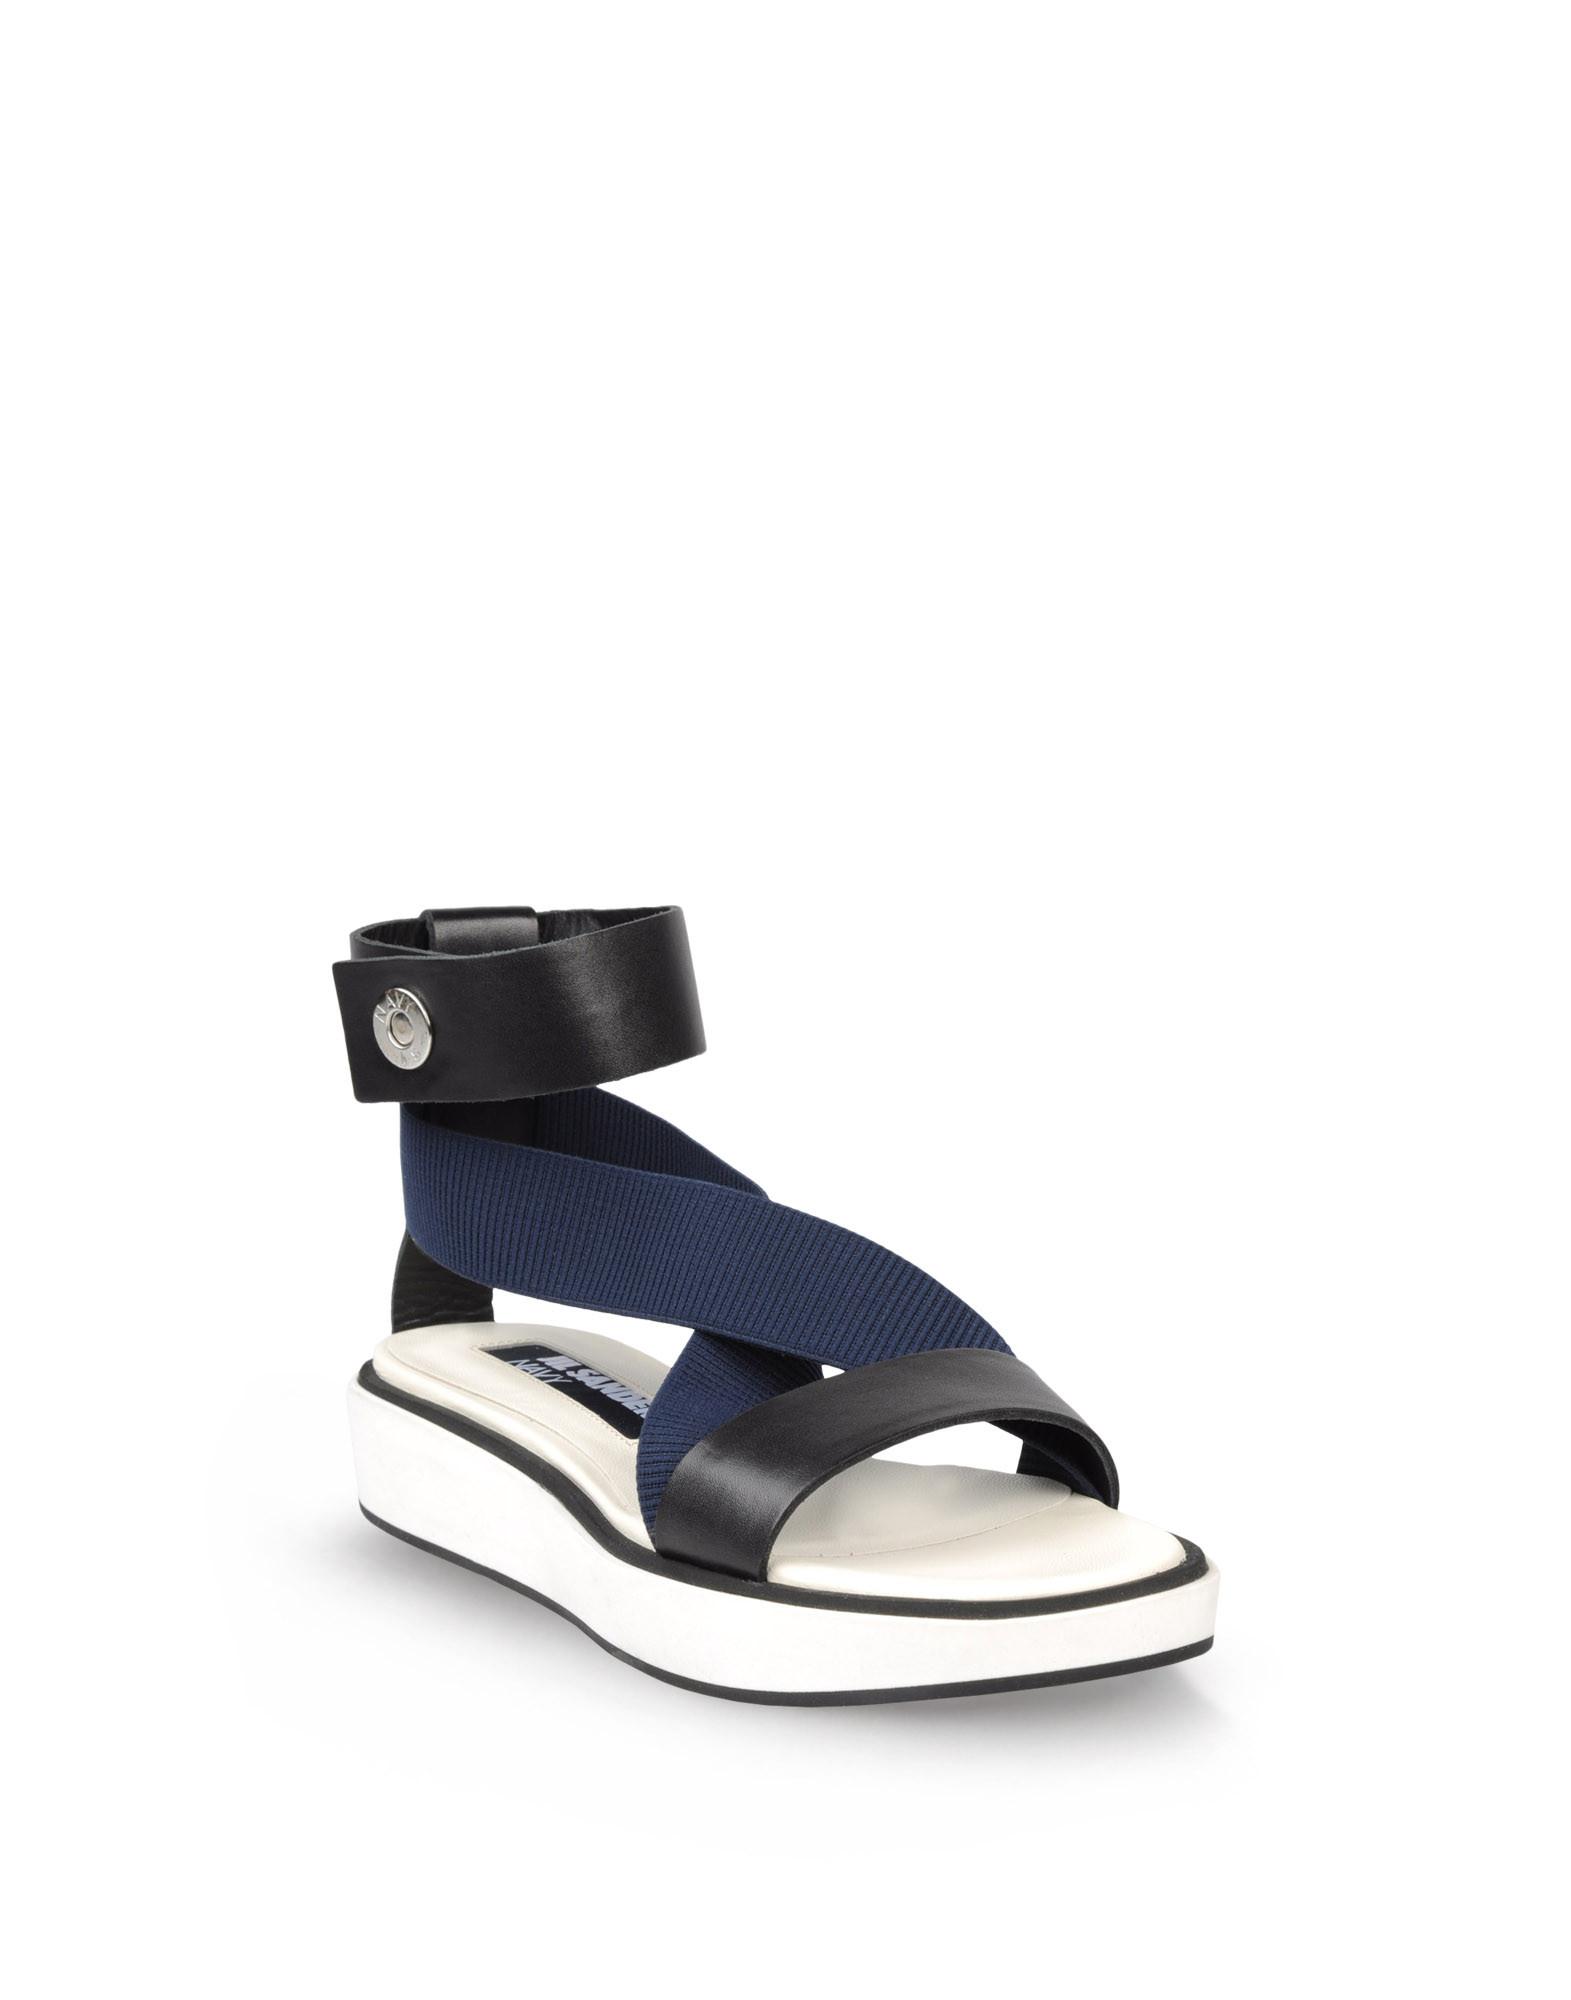 7c5a953c39617 Sandals Women - Shoes Women on Jil Sander Online Store